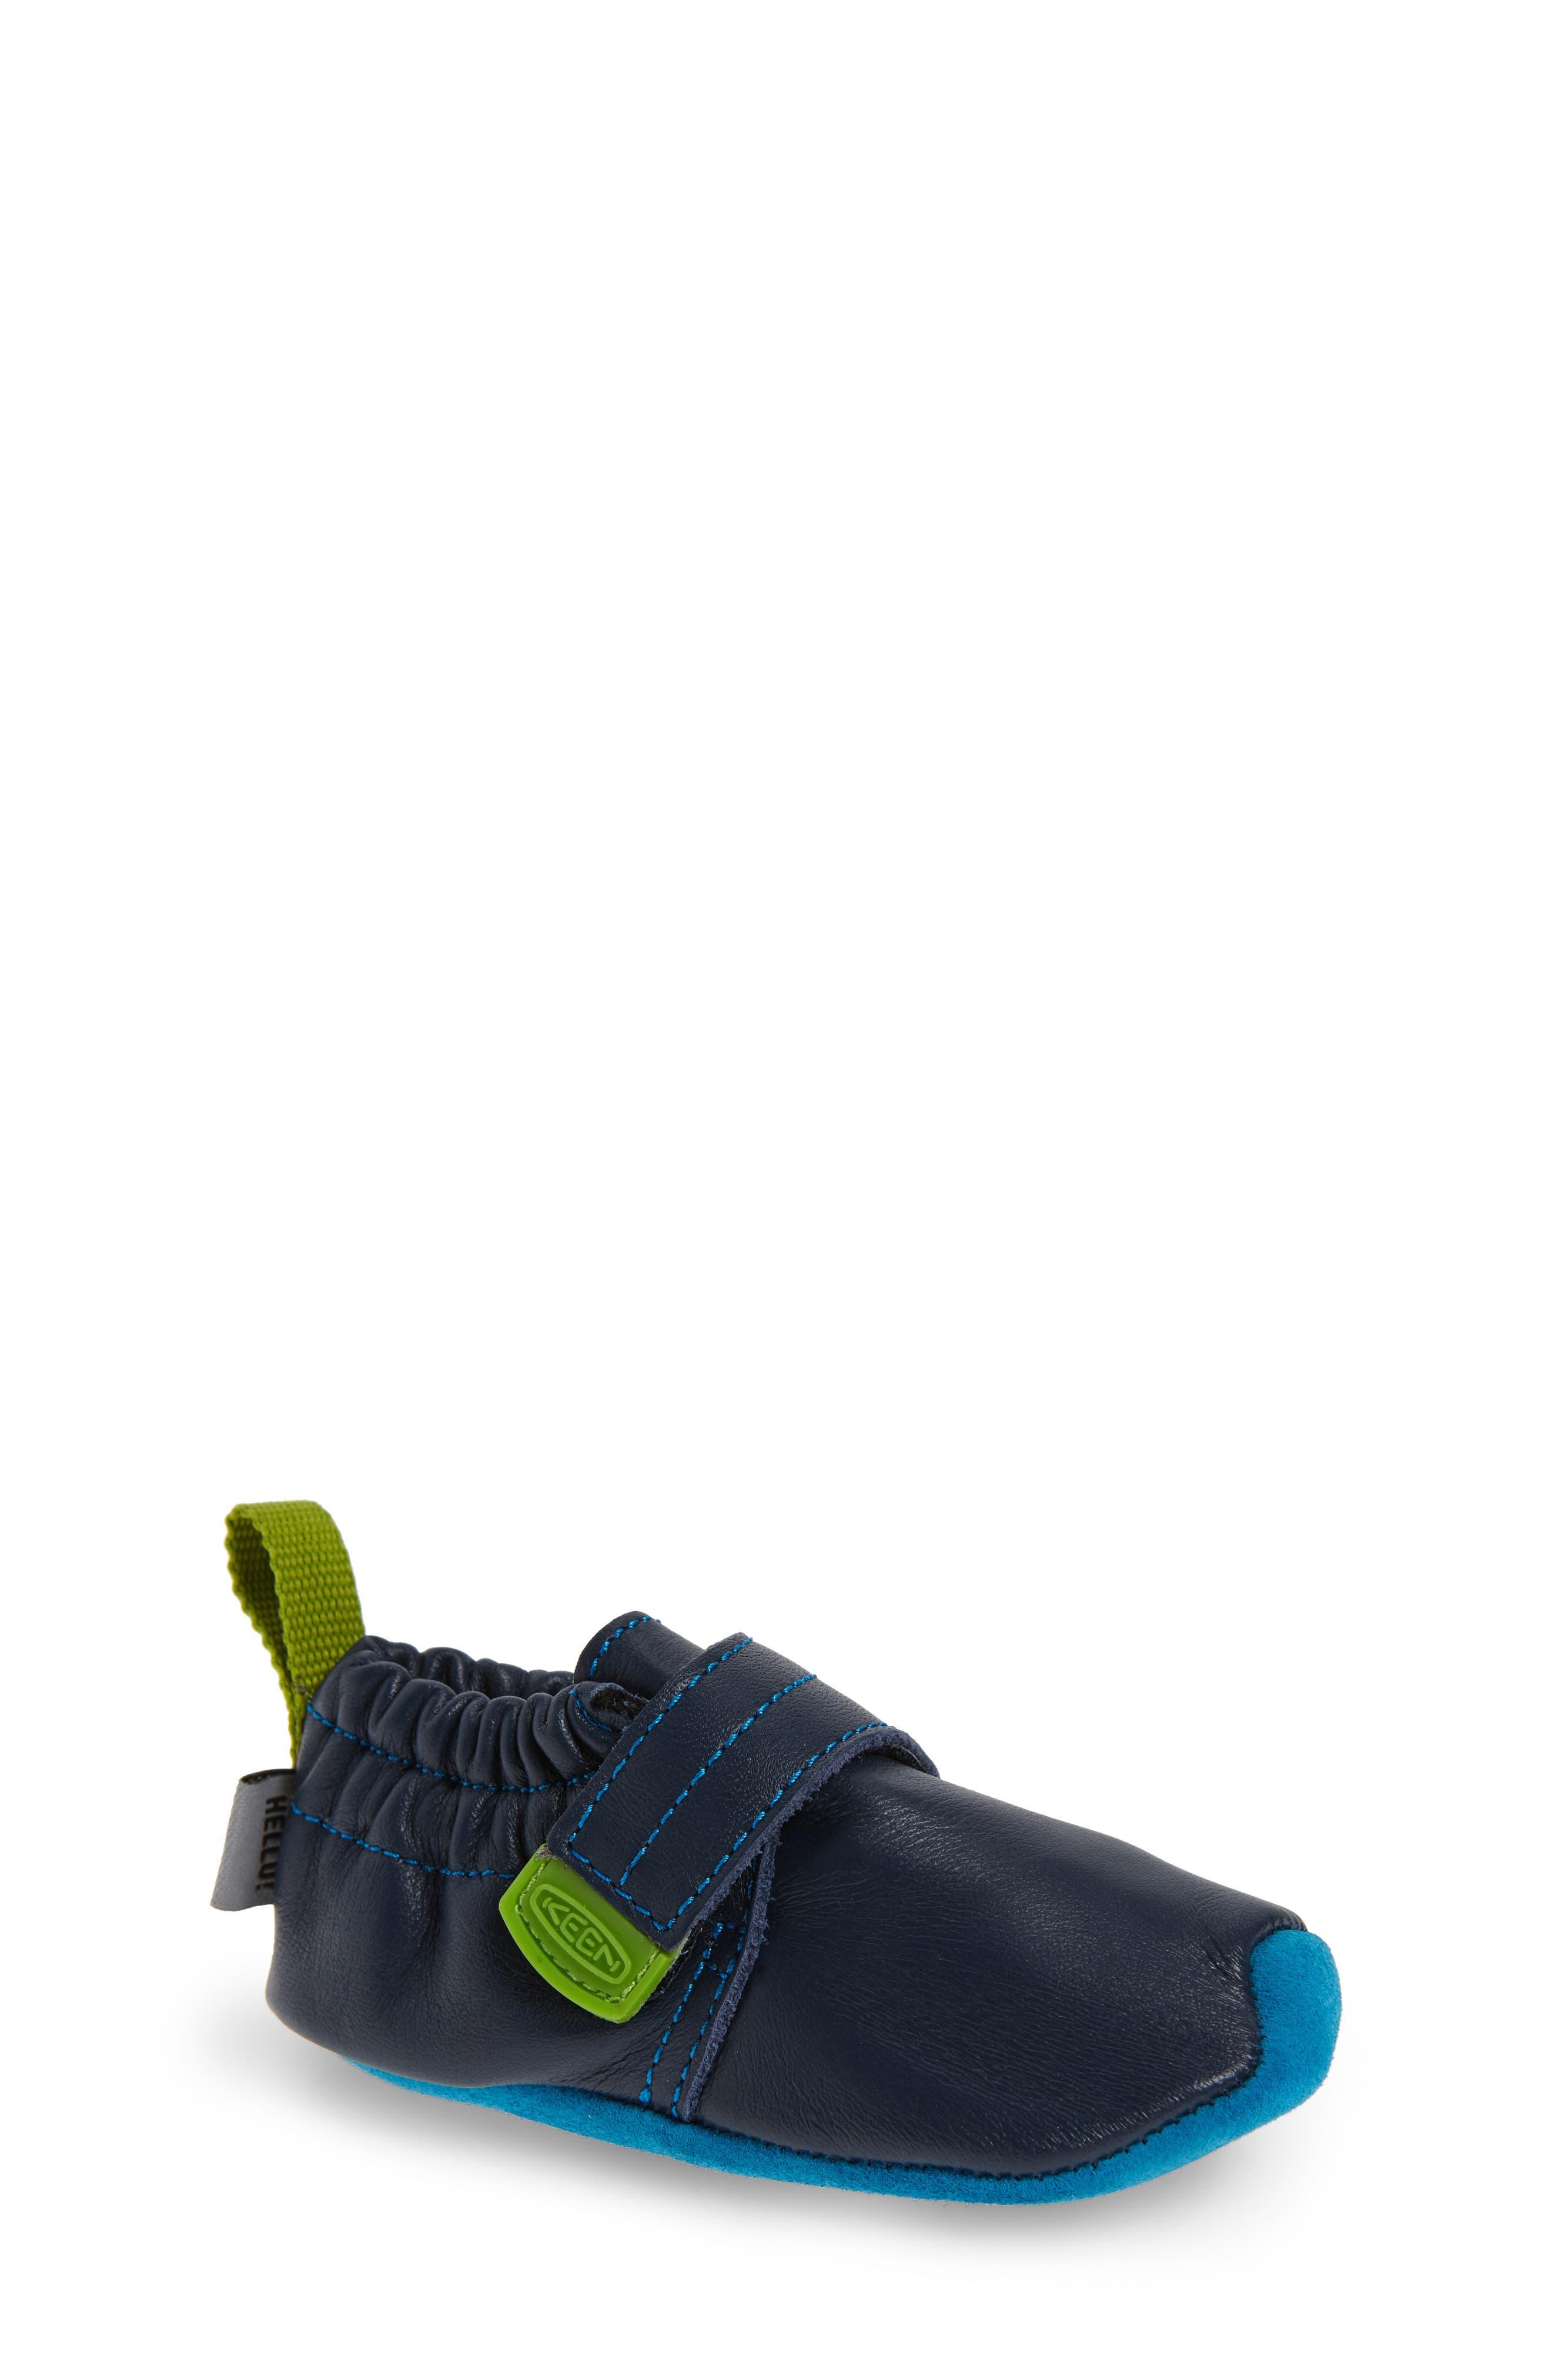 Alternate Image 1 Selected - Keen Leo Crib Shoe (Baby & Walker)